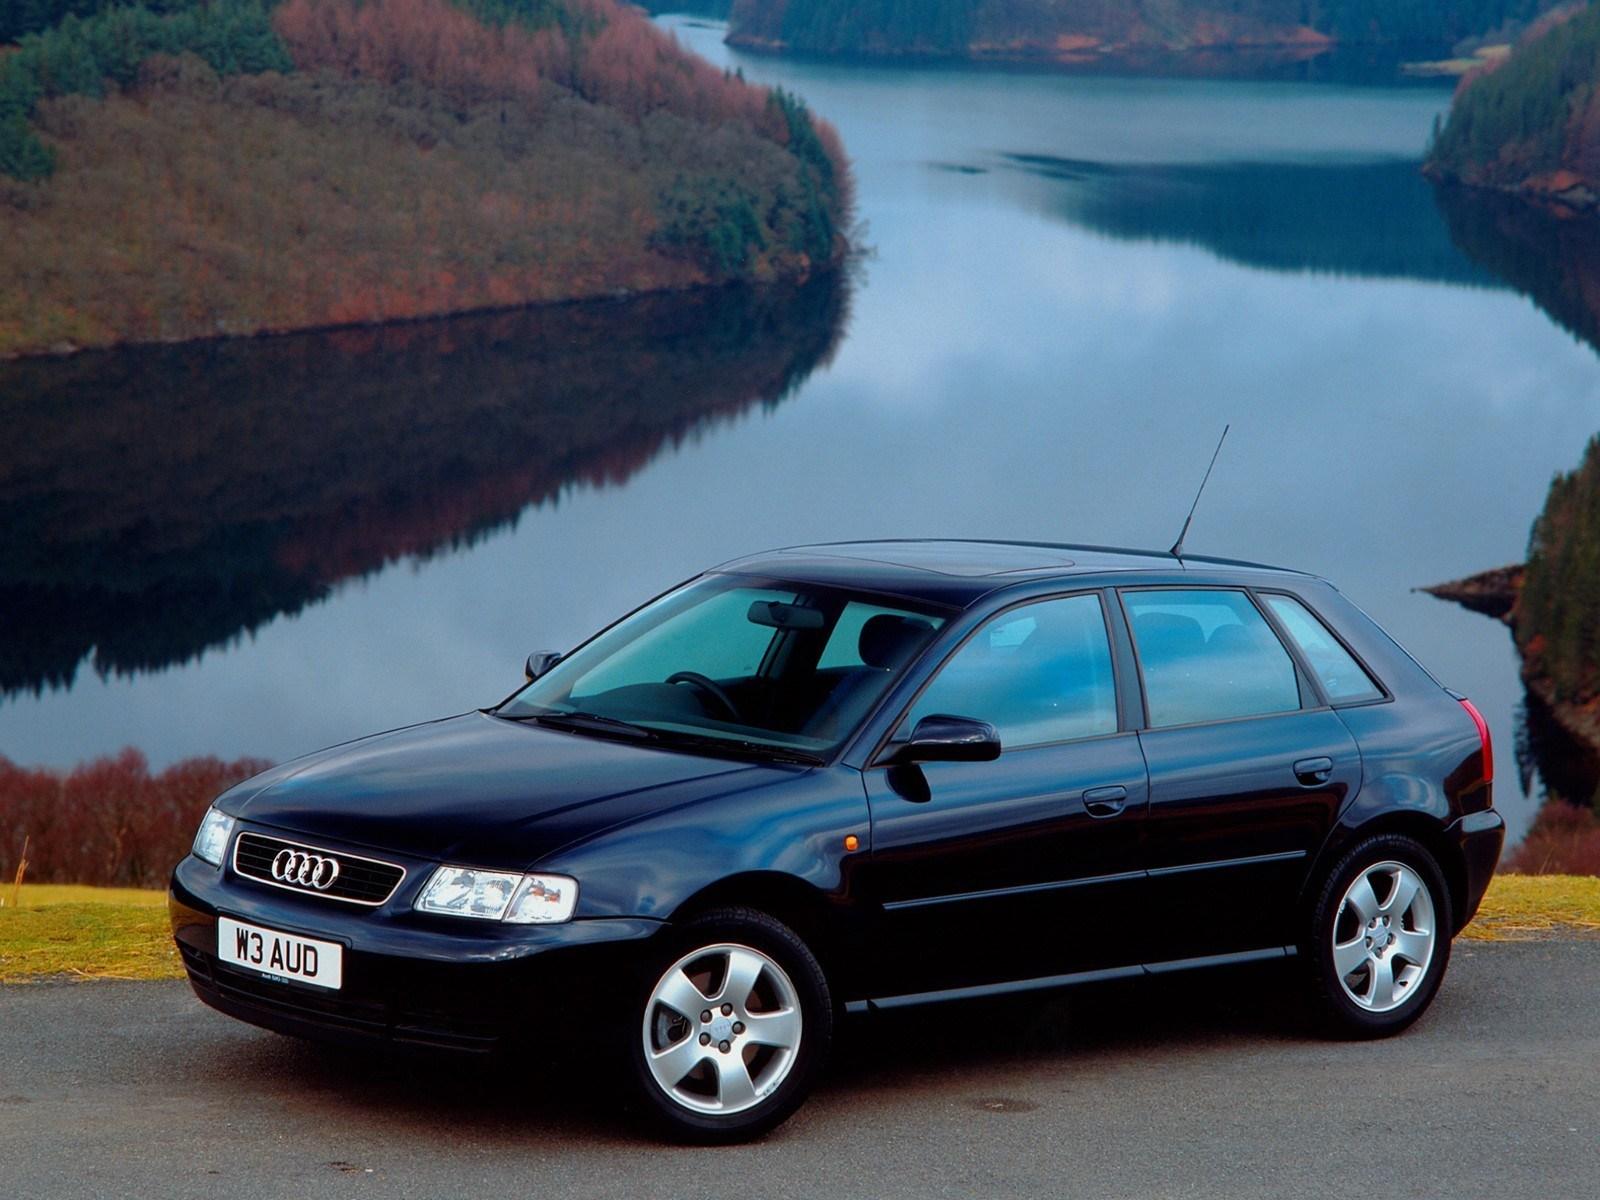 Audi A3 Sportback Specs Photos 1999 2000 2001 2002 2003 Tuning Hd 1600x1200